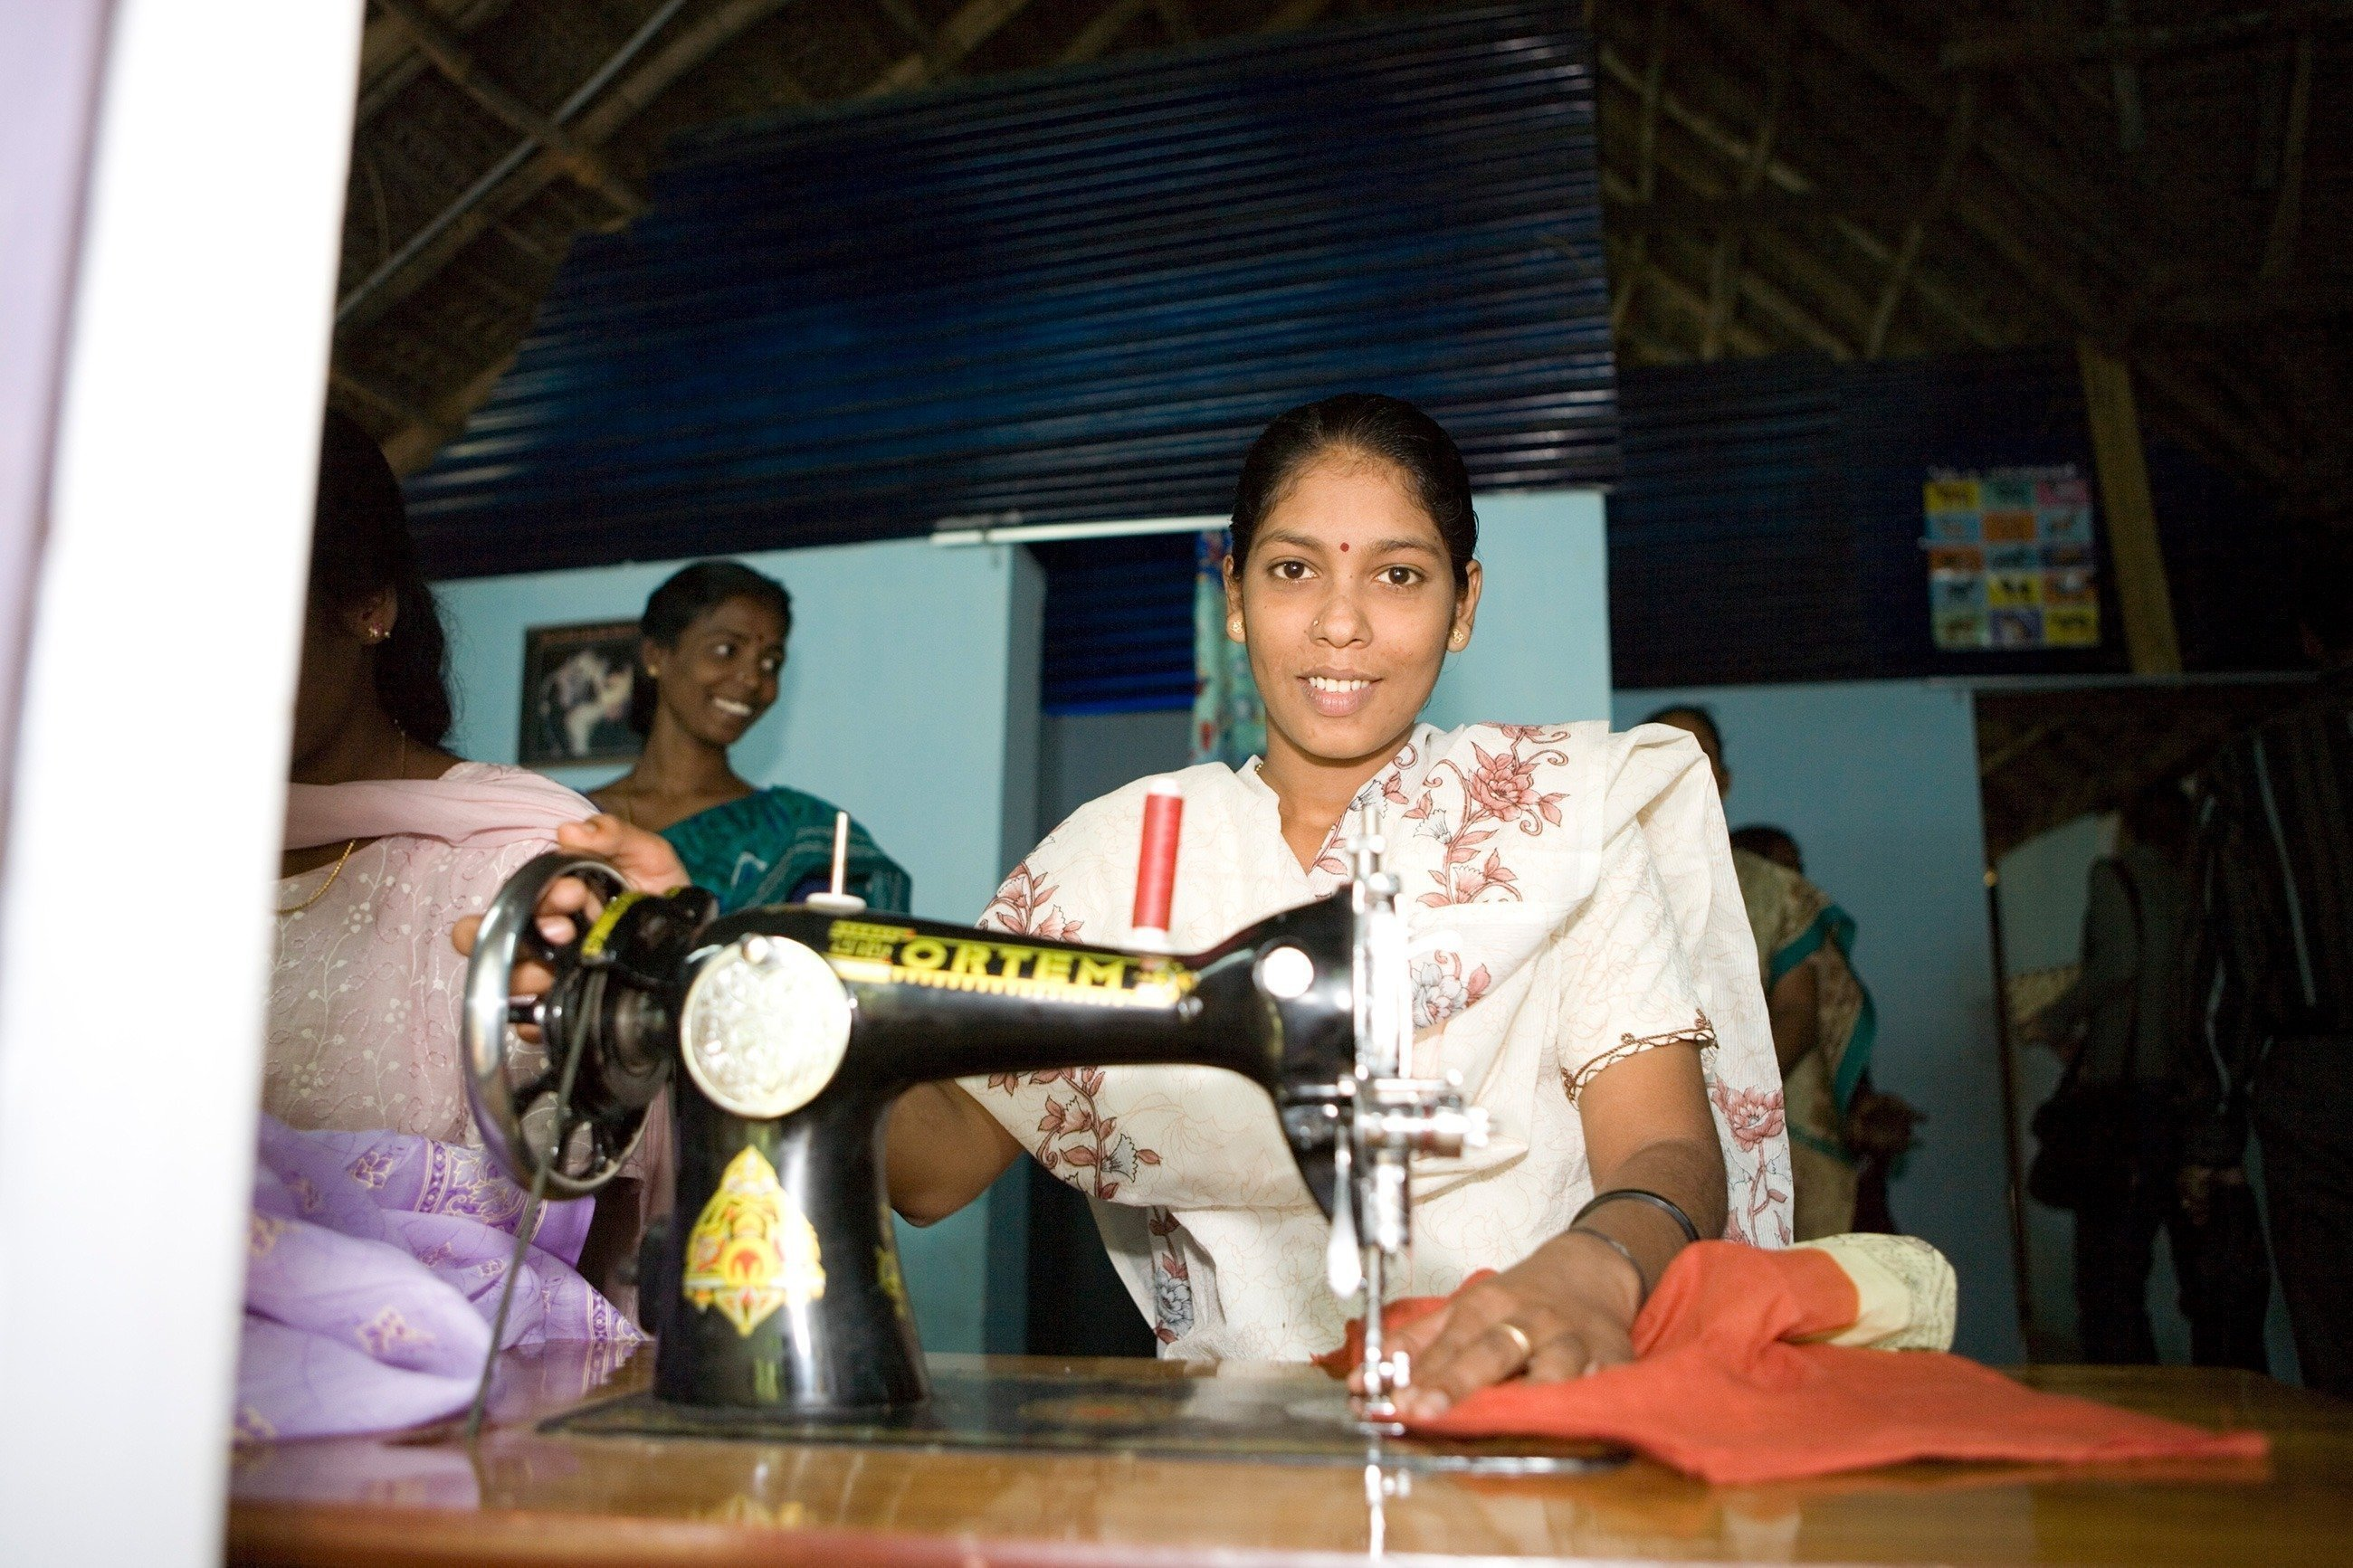 Una donna indiana intenta a cucire.